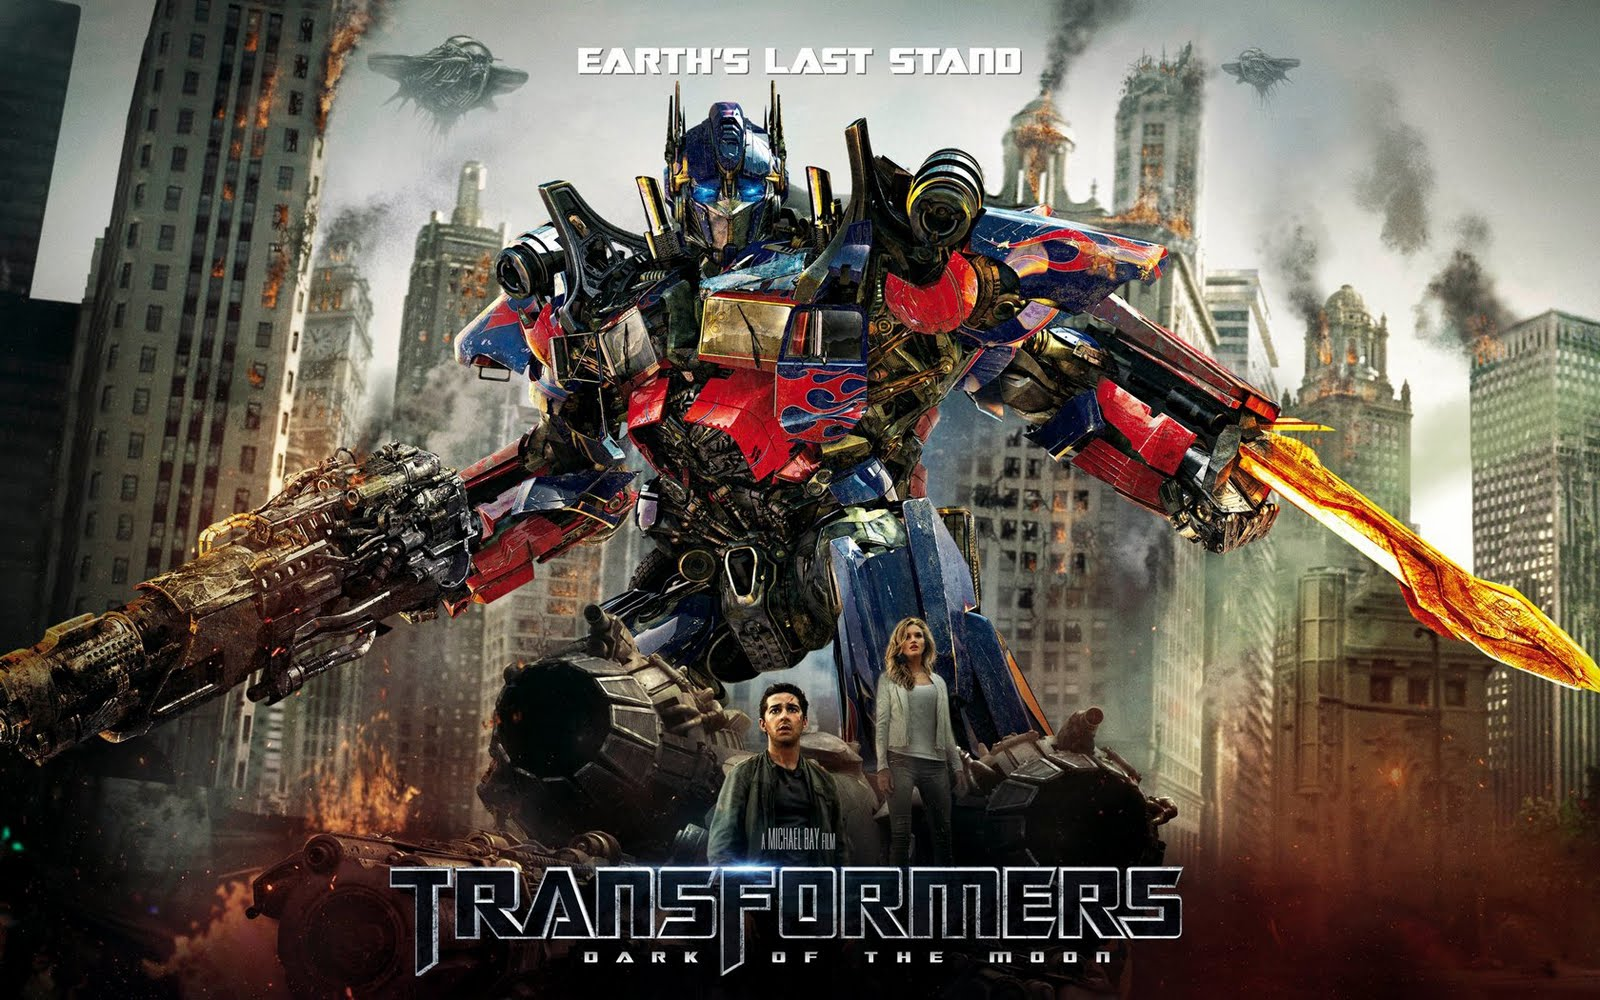 transformers 3 dark of the moon movie